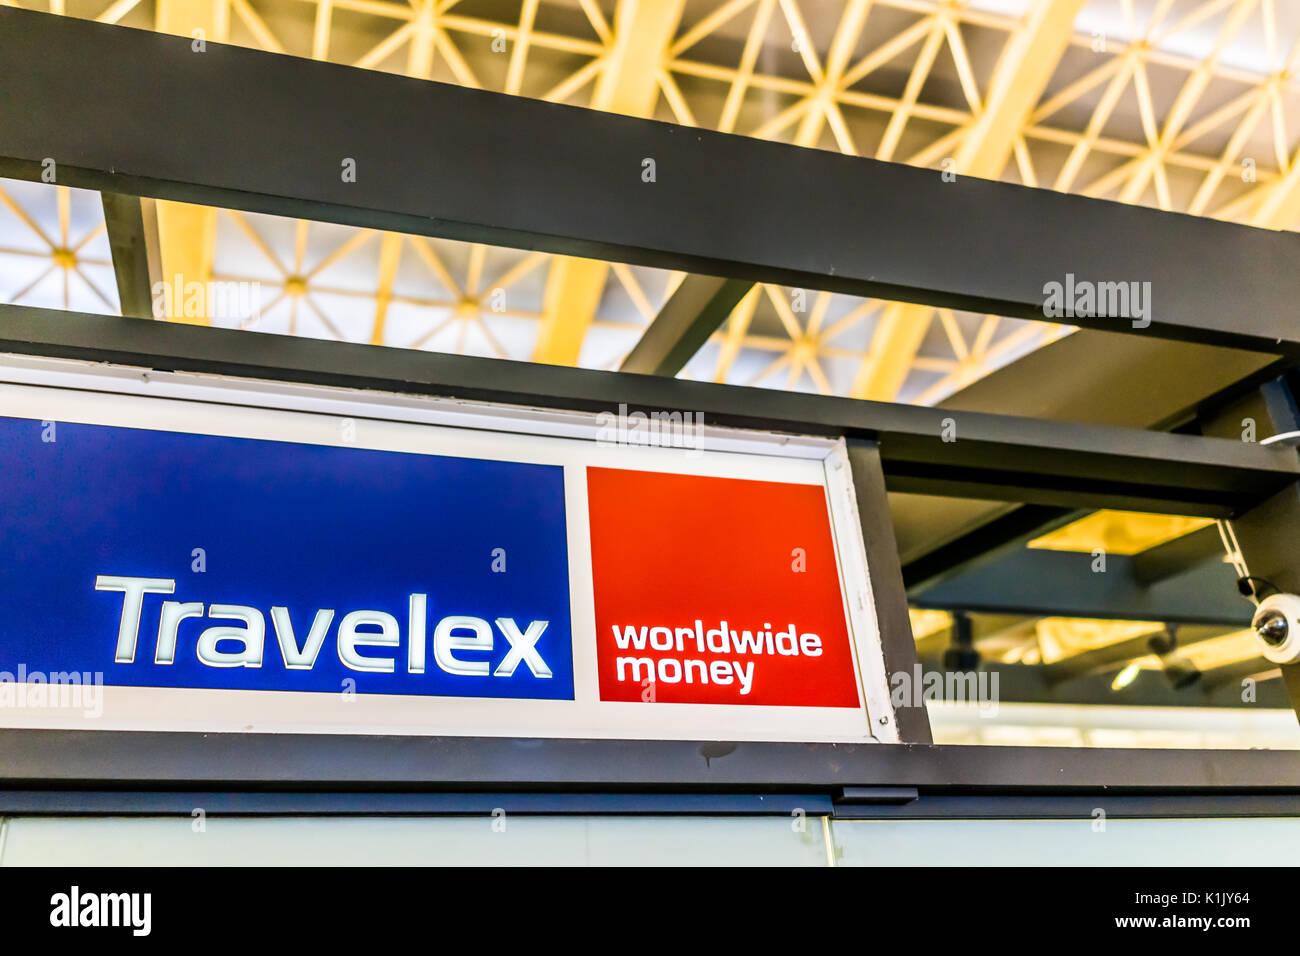 travelex airport stock photos travelex airport stock images alamy. Black Bedroom Furniture Sets. Home Design Ideas